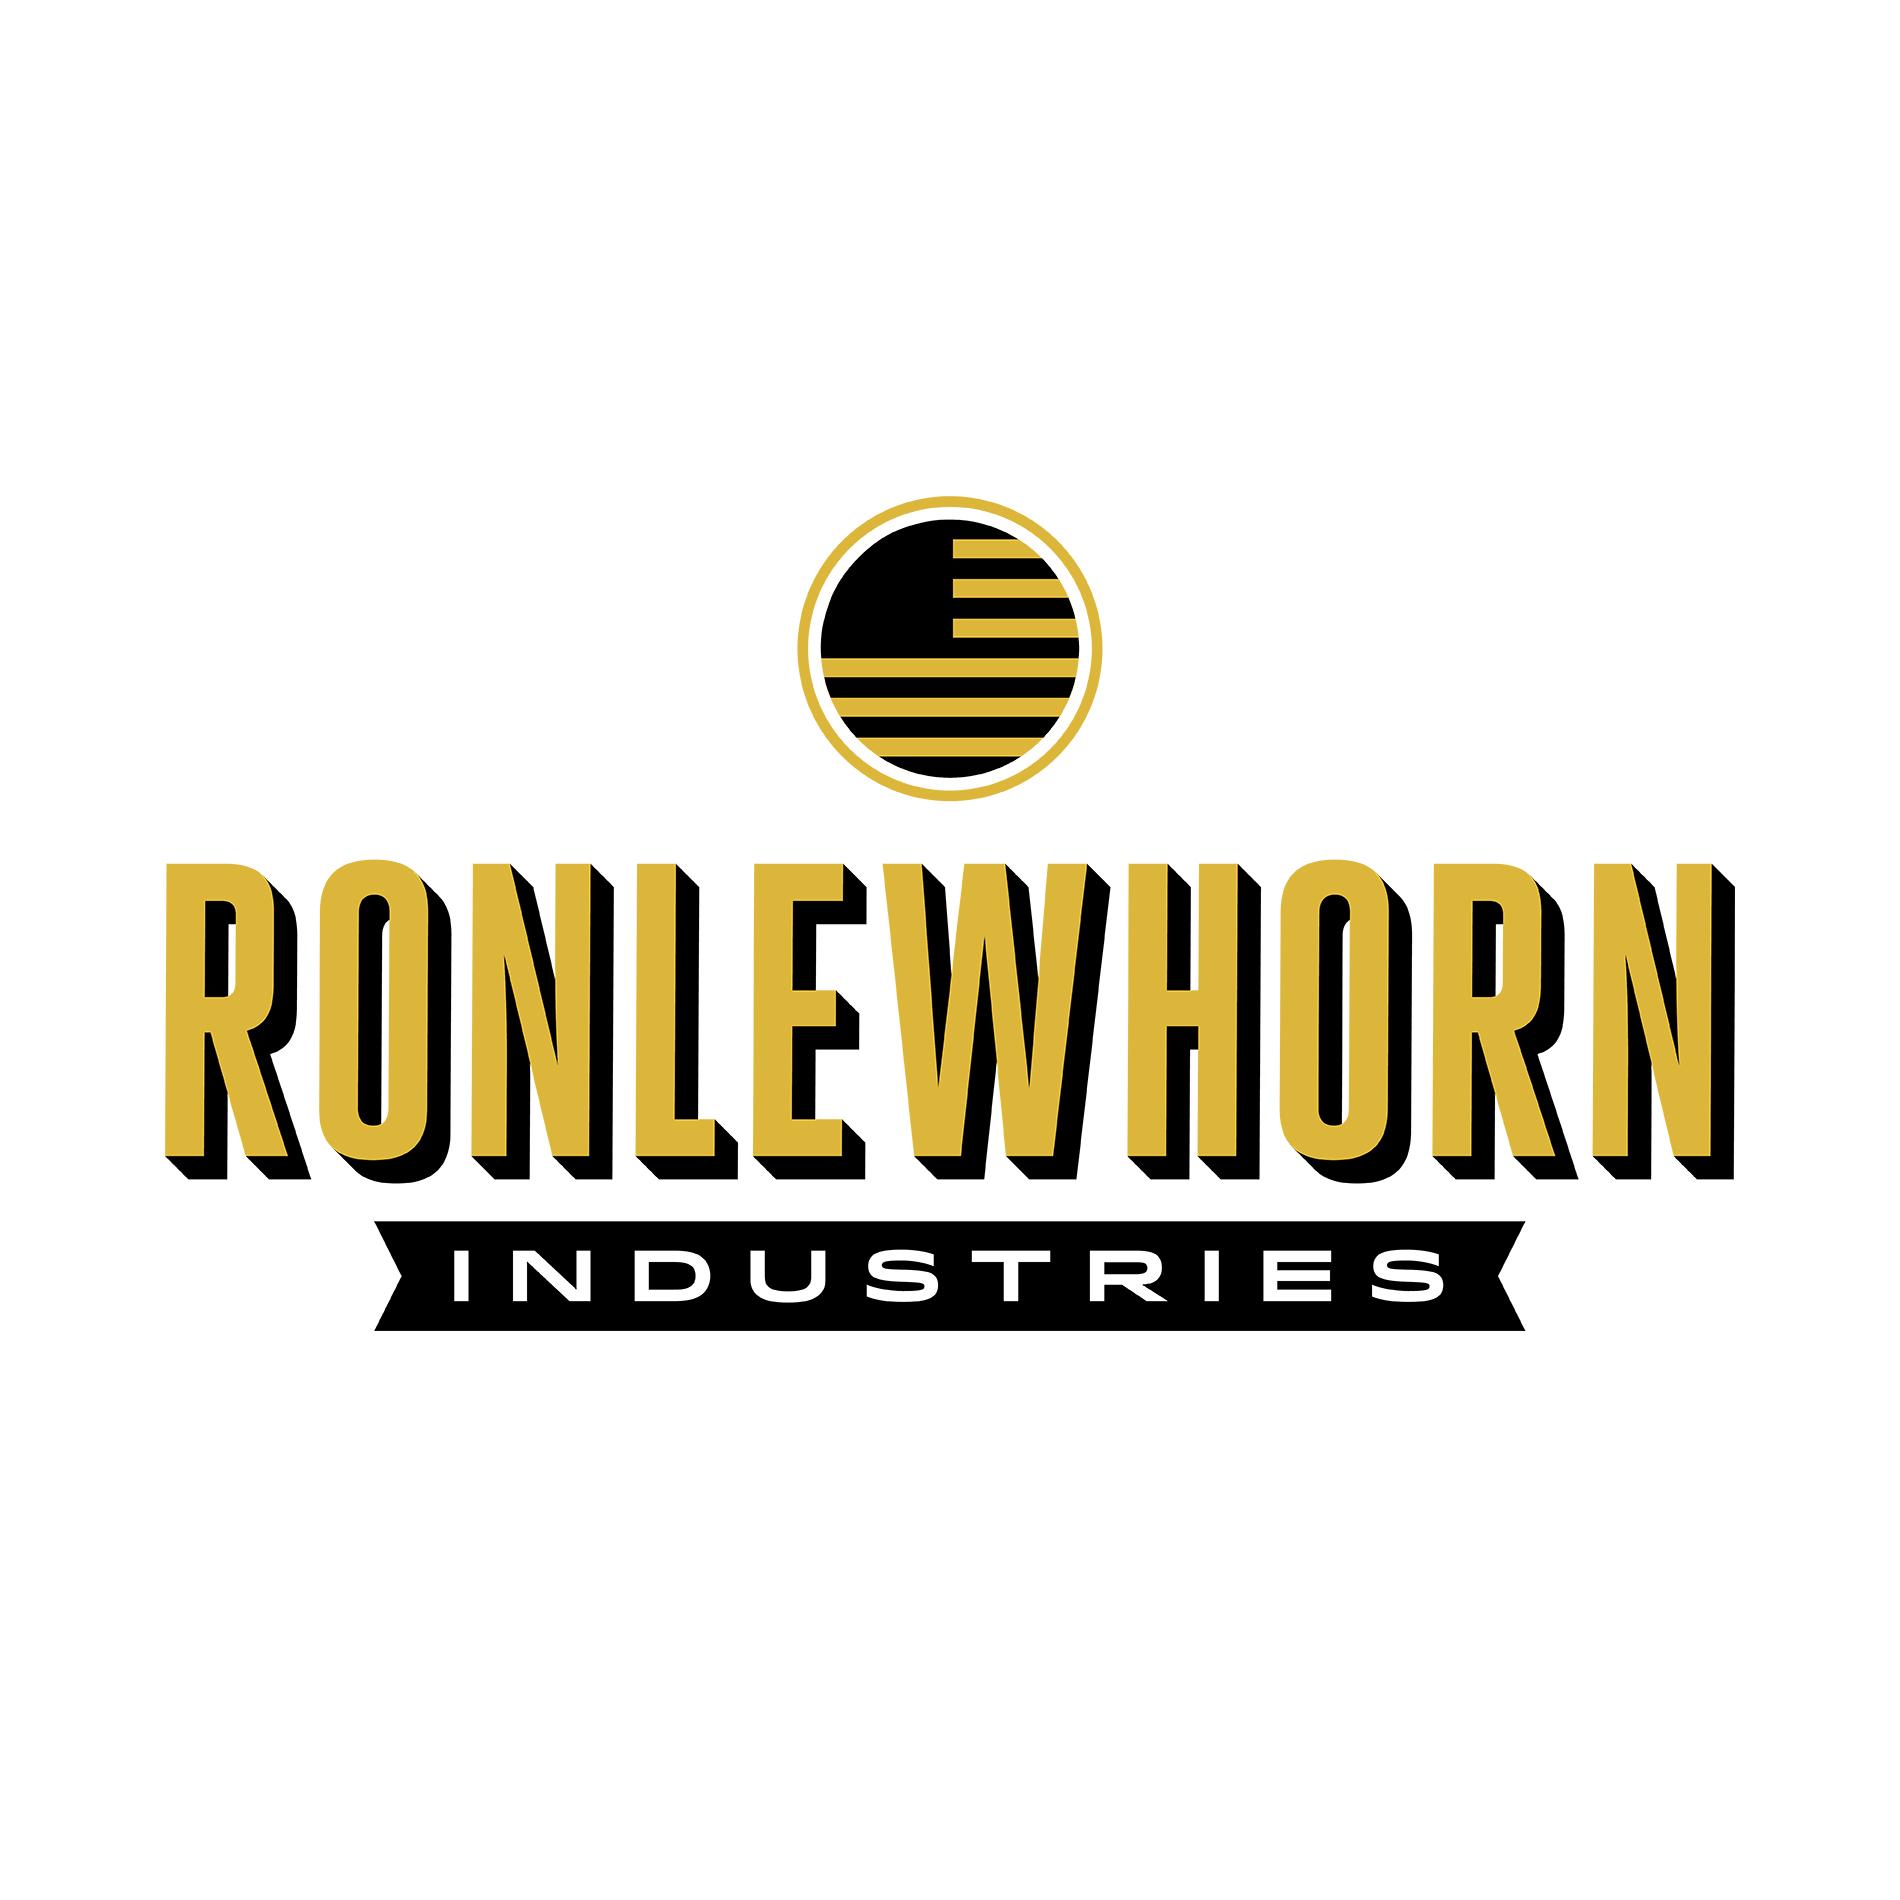 RonlewhornIndustriesLOGO_SQ.jpg